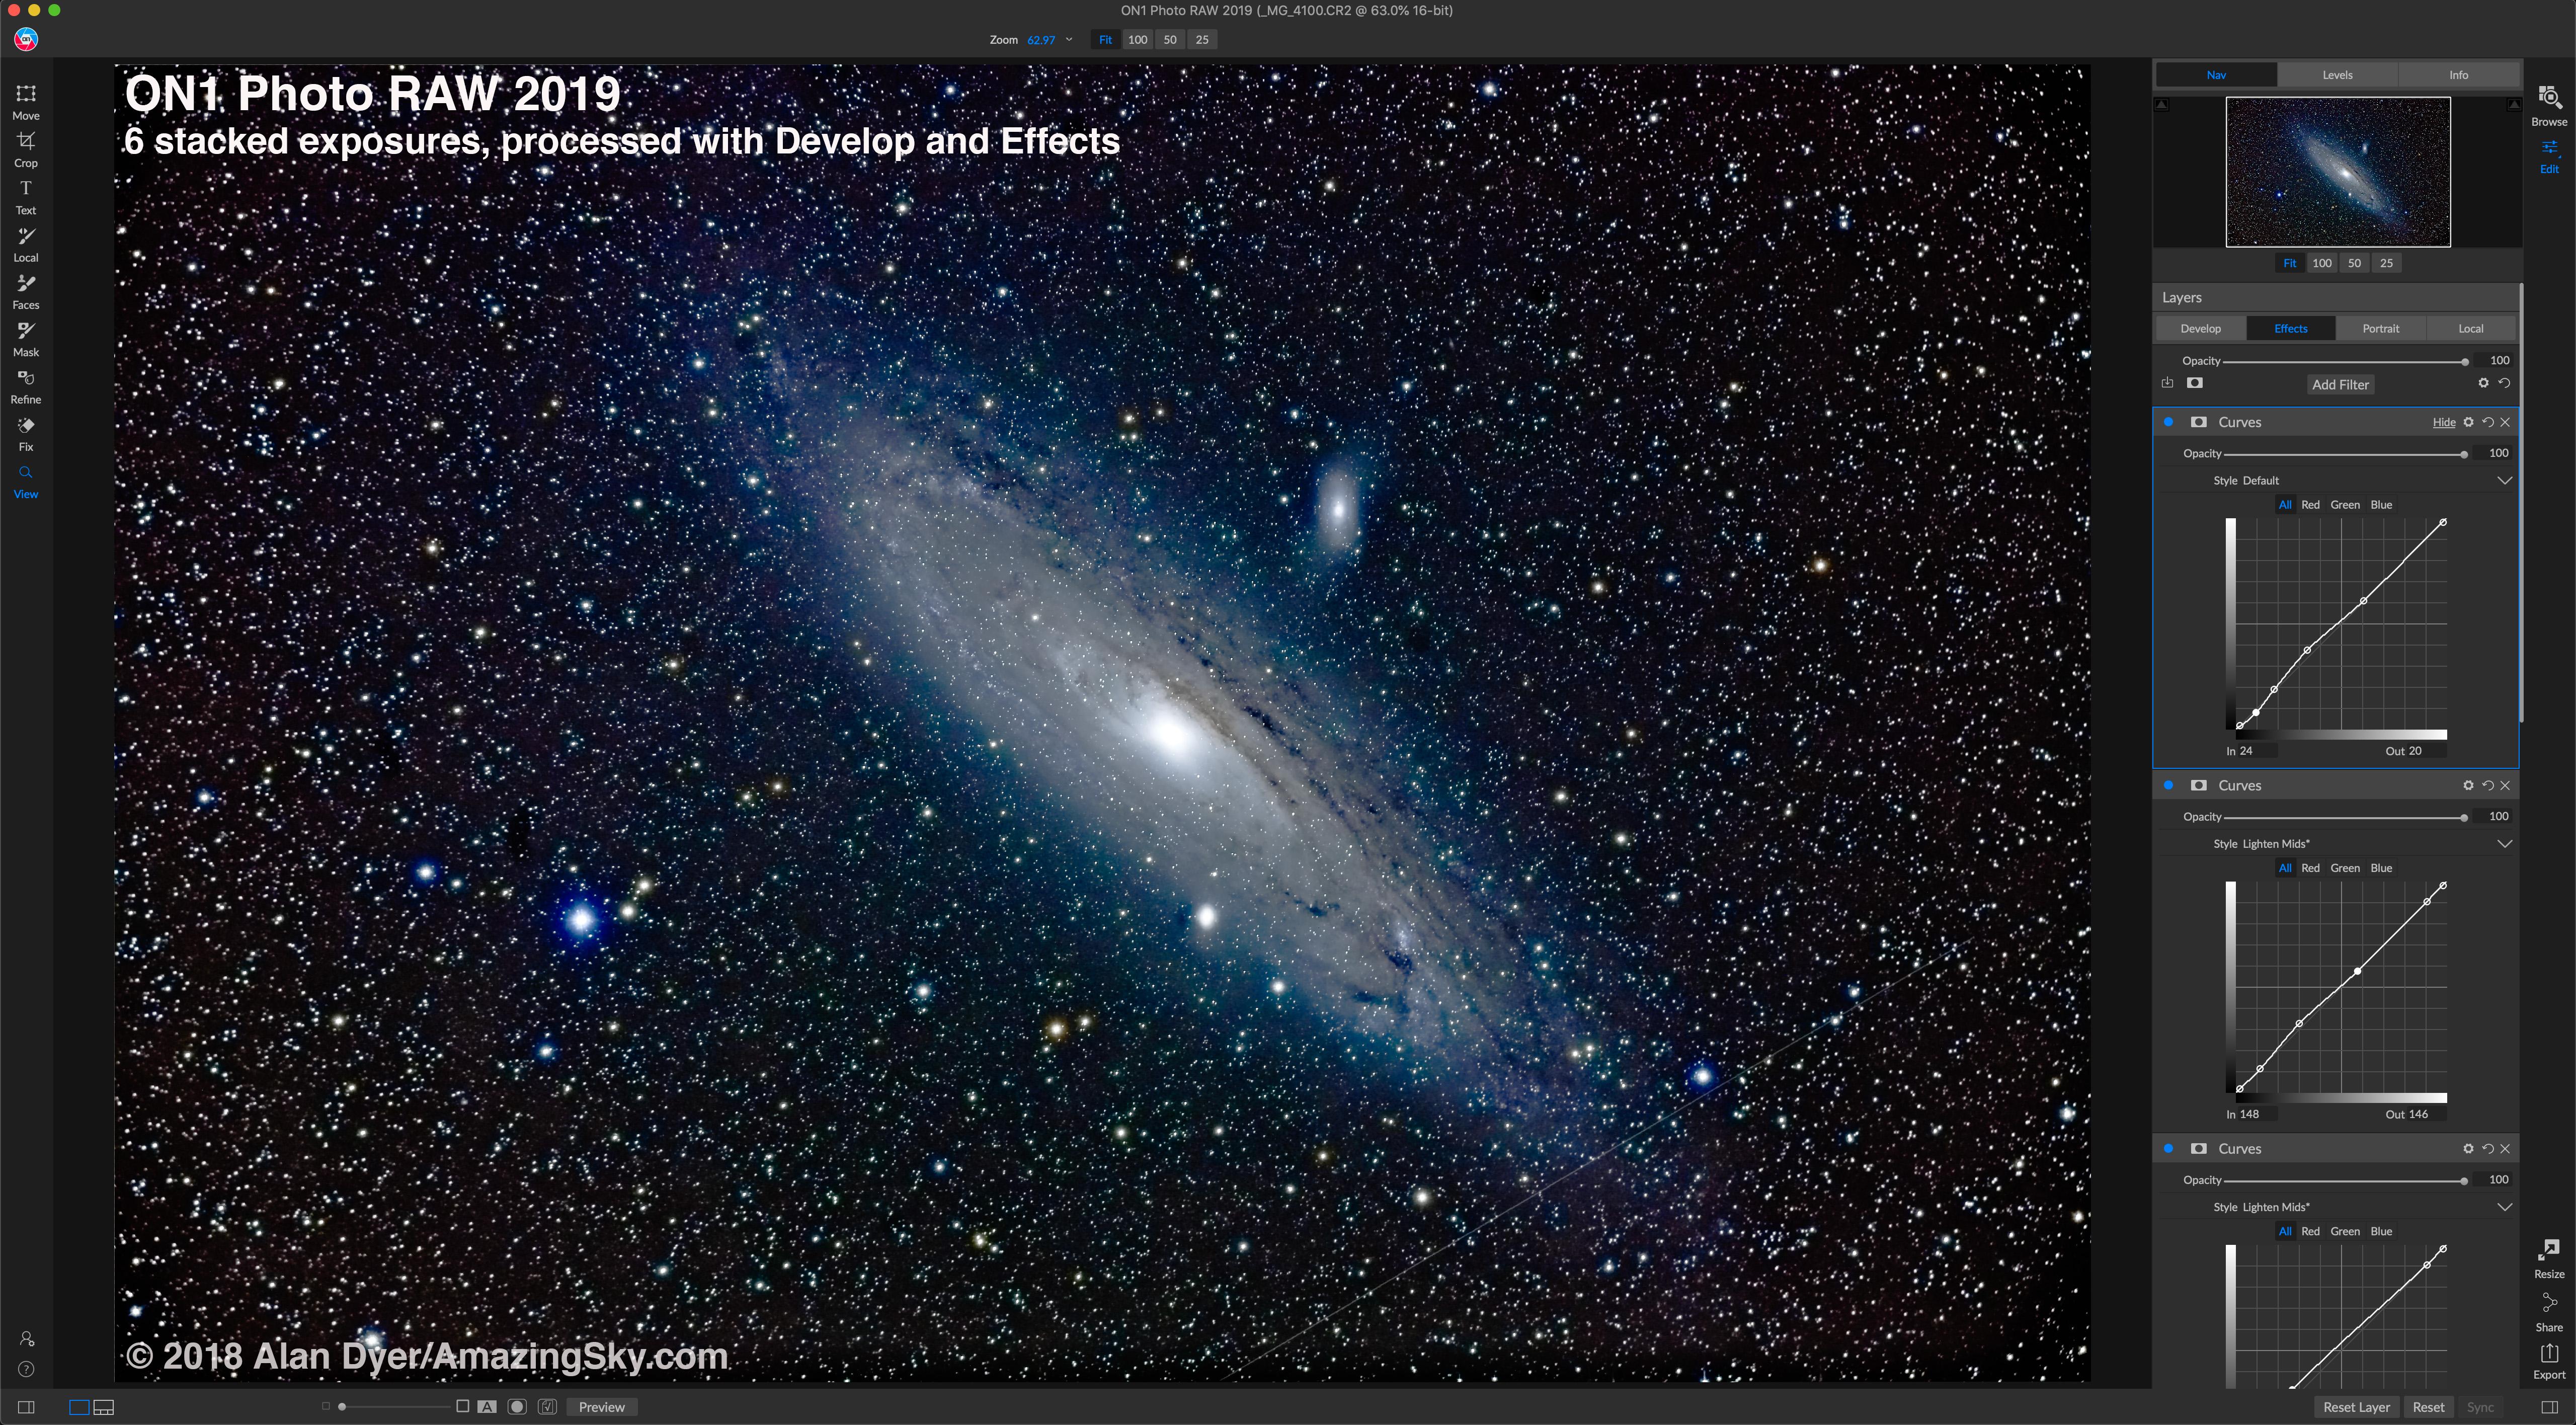 ON1 Processed M31